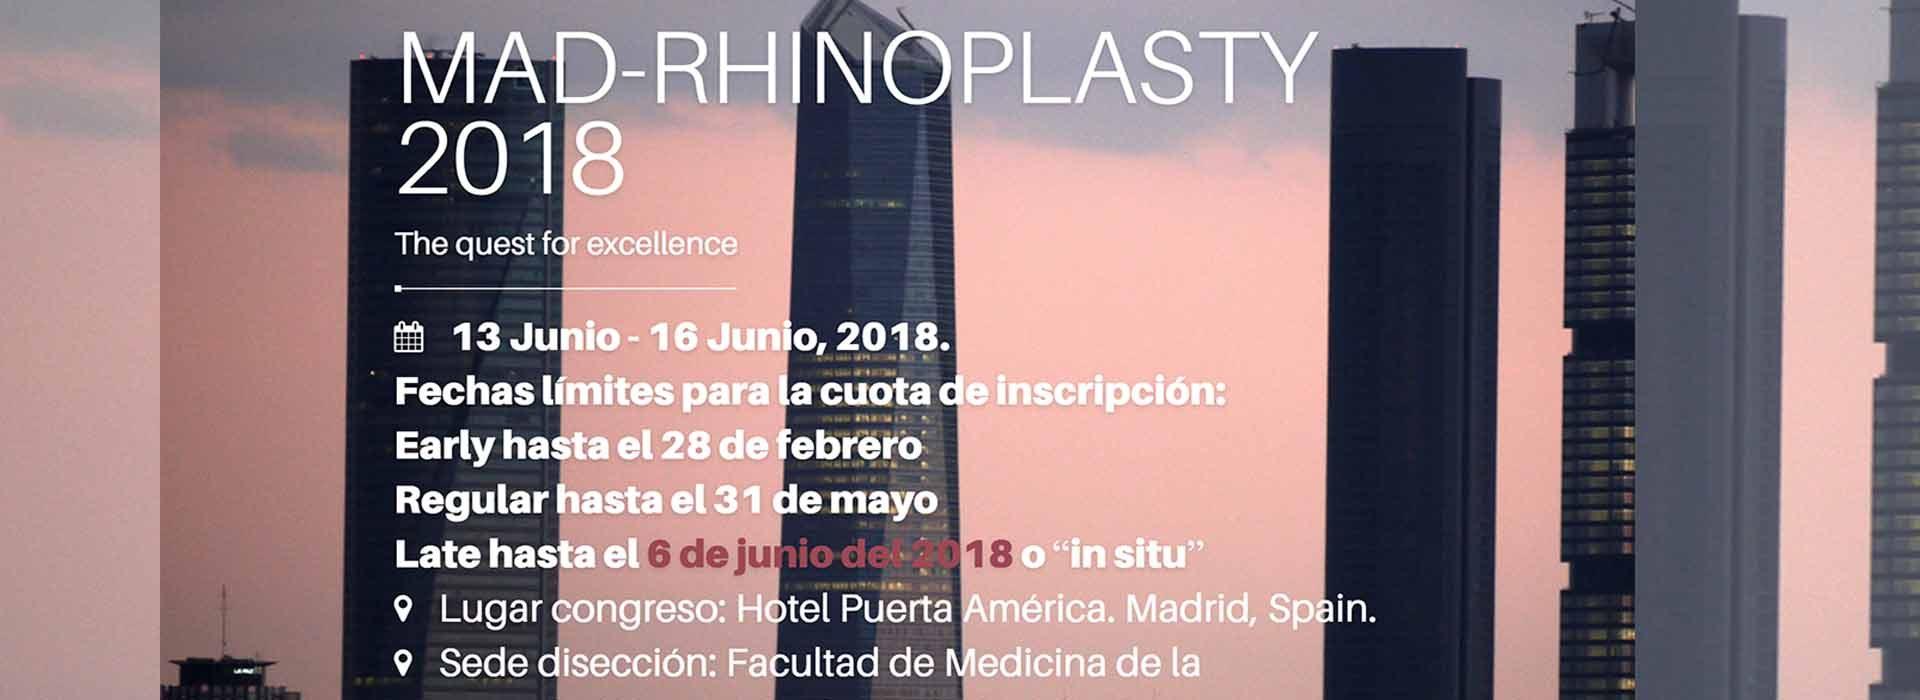 Dr. Javier Galindo dirige el congreso MAD-Rhinoplasty 2018